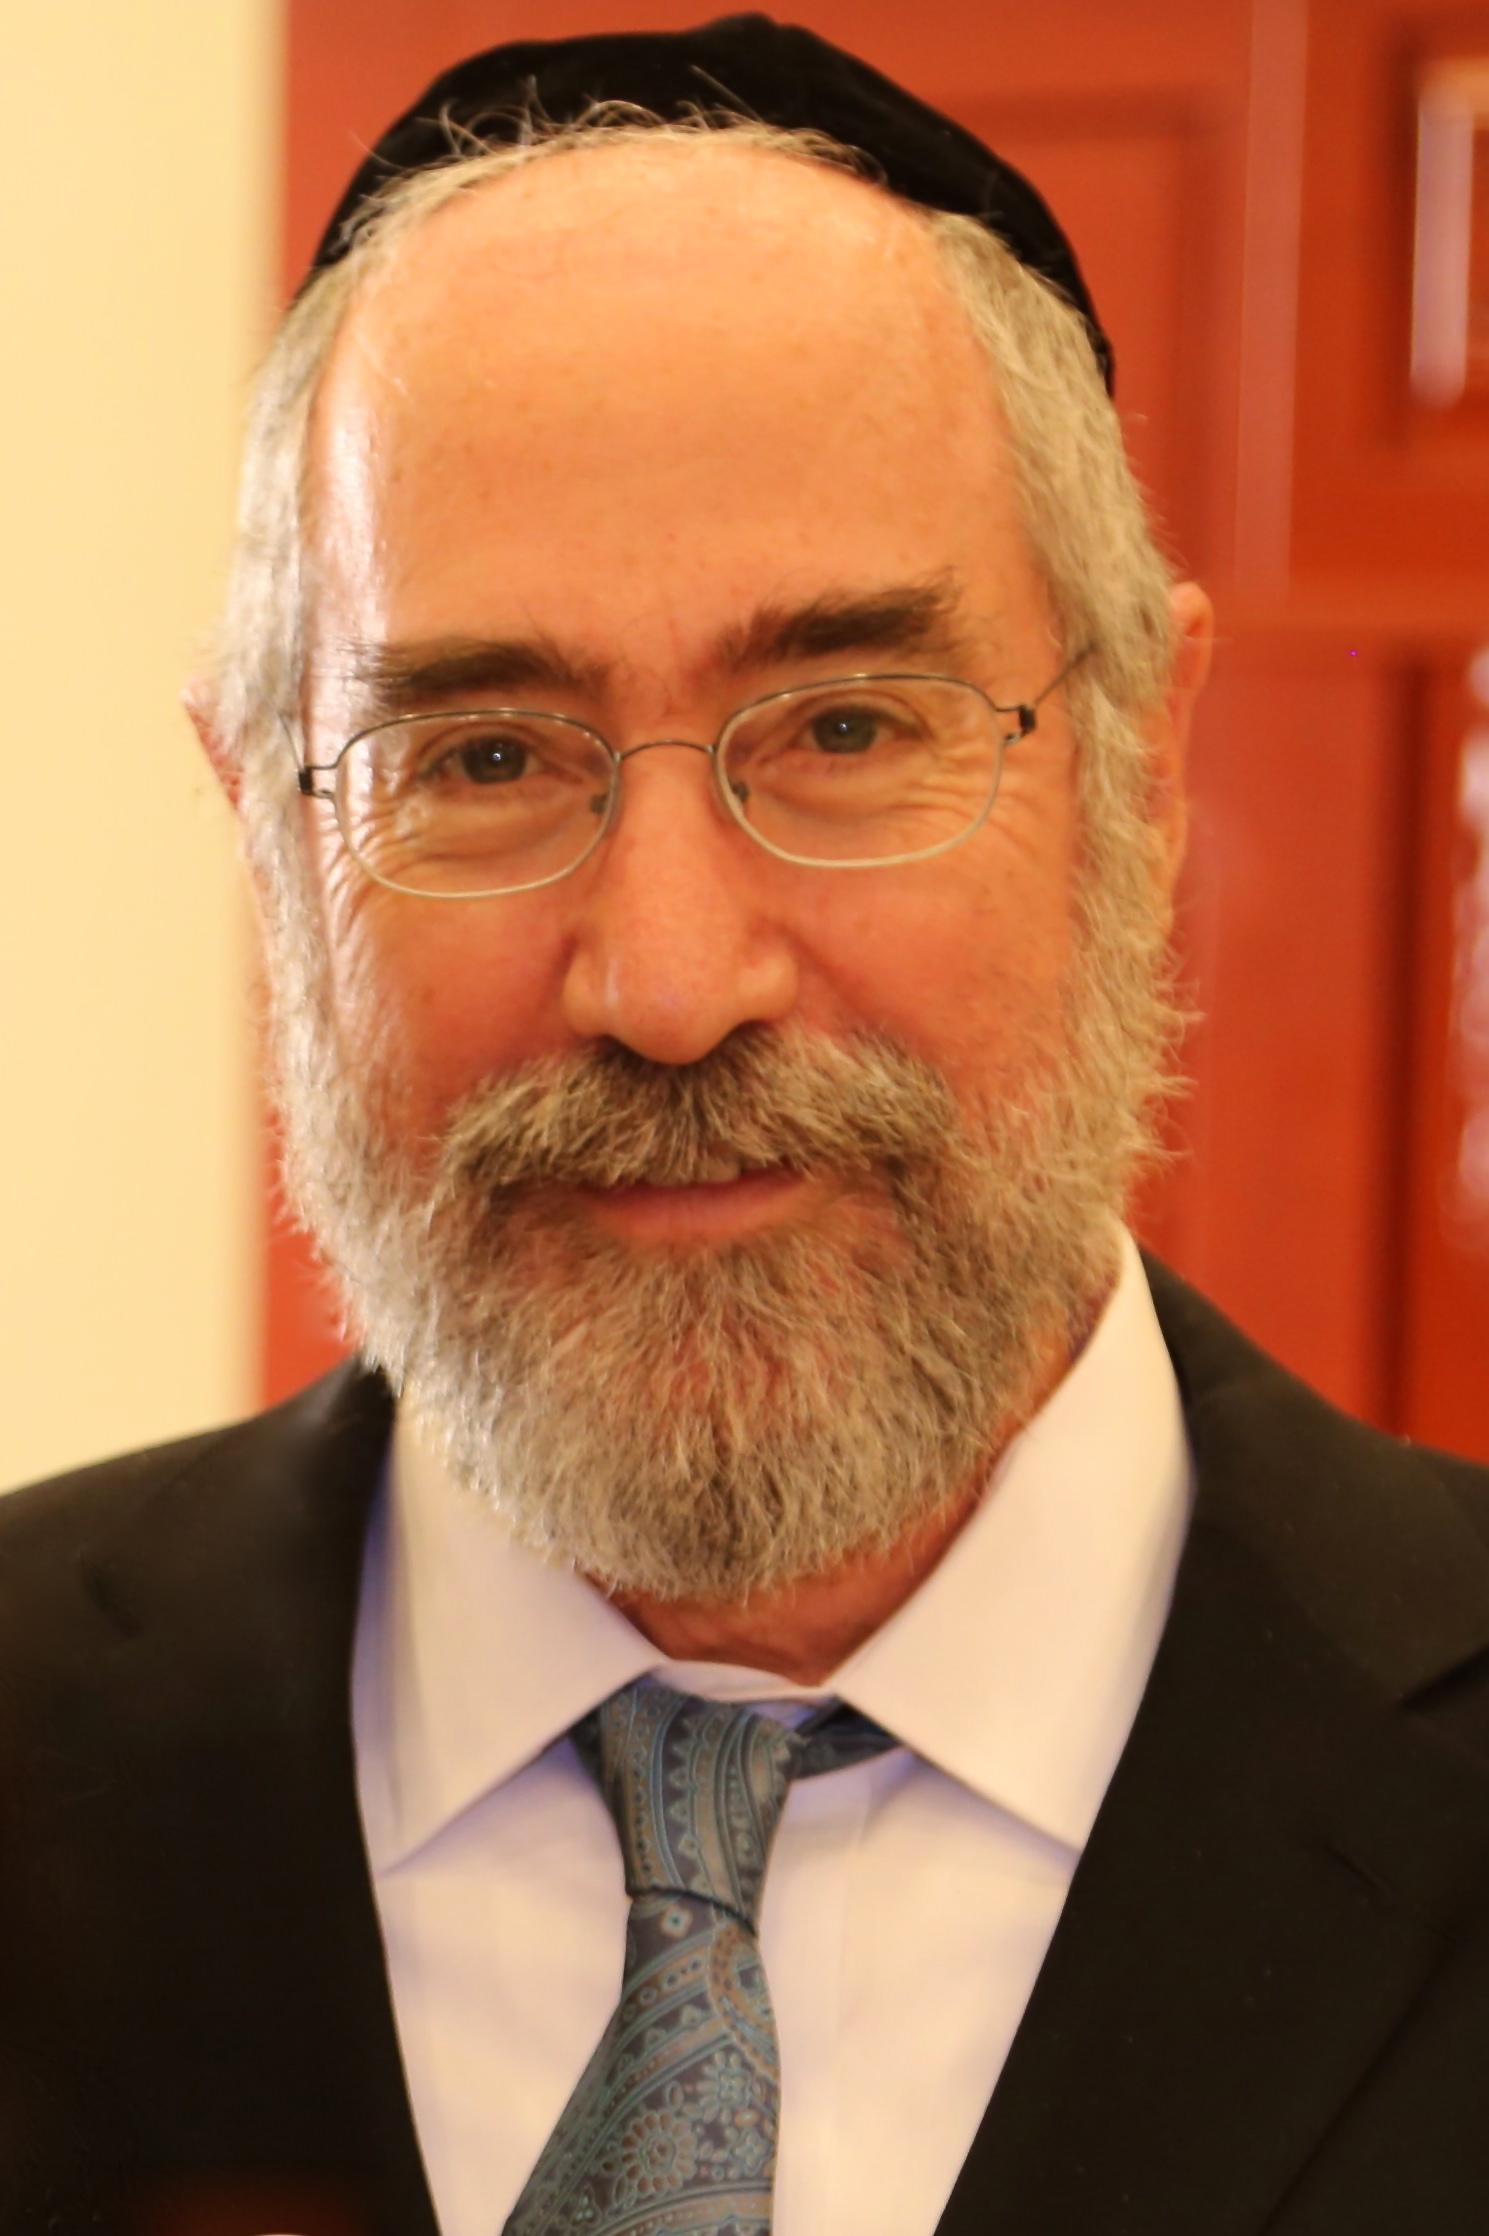 Stewart J. Levin, Attorney at law